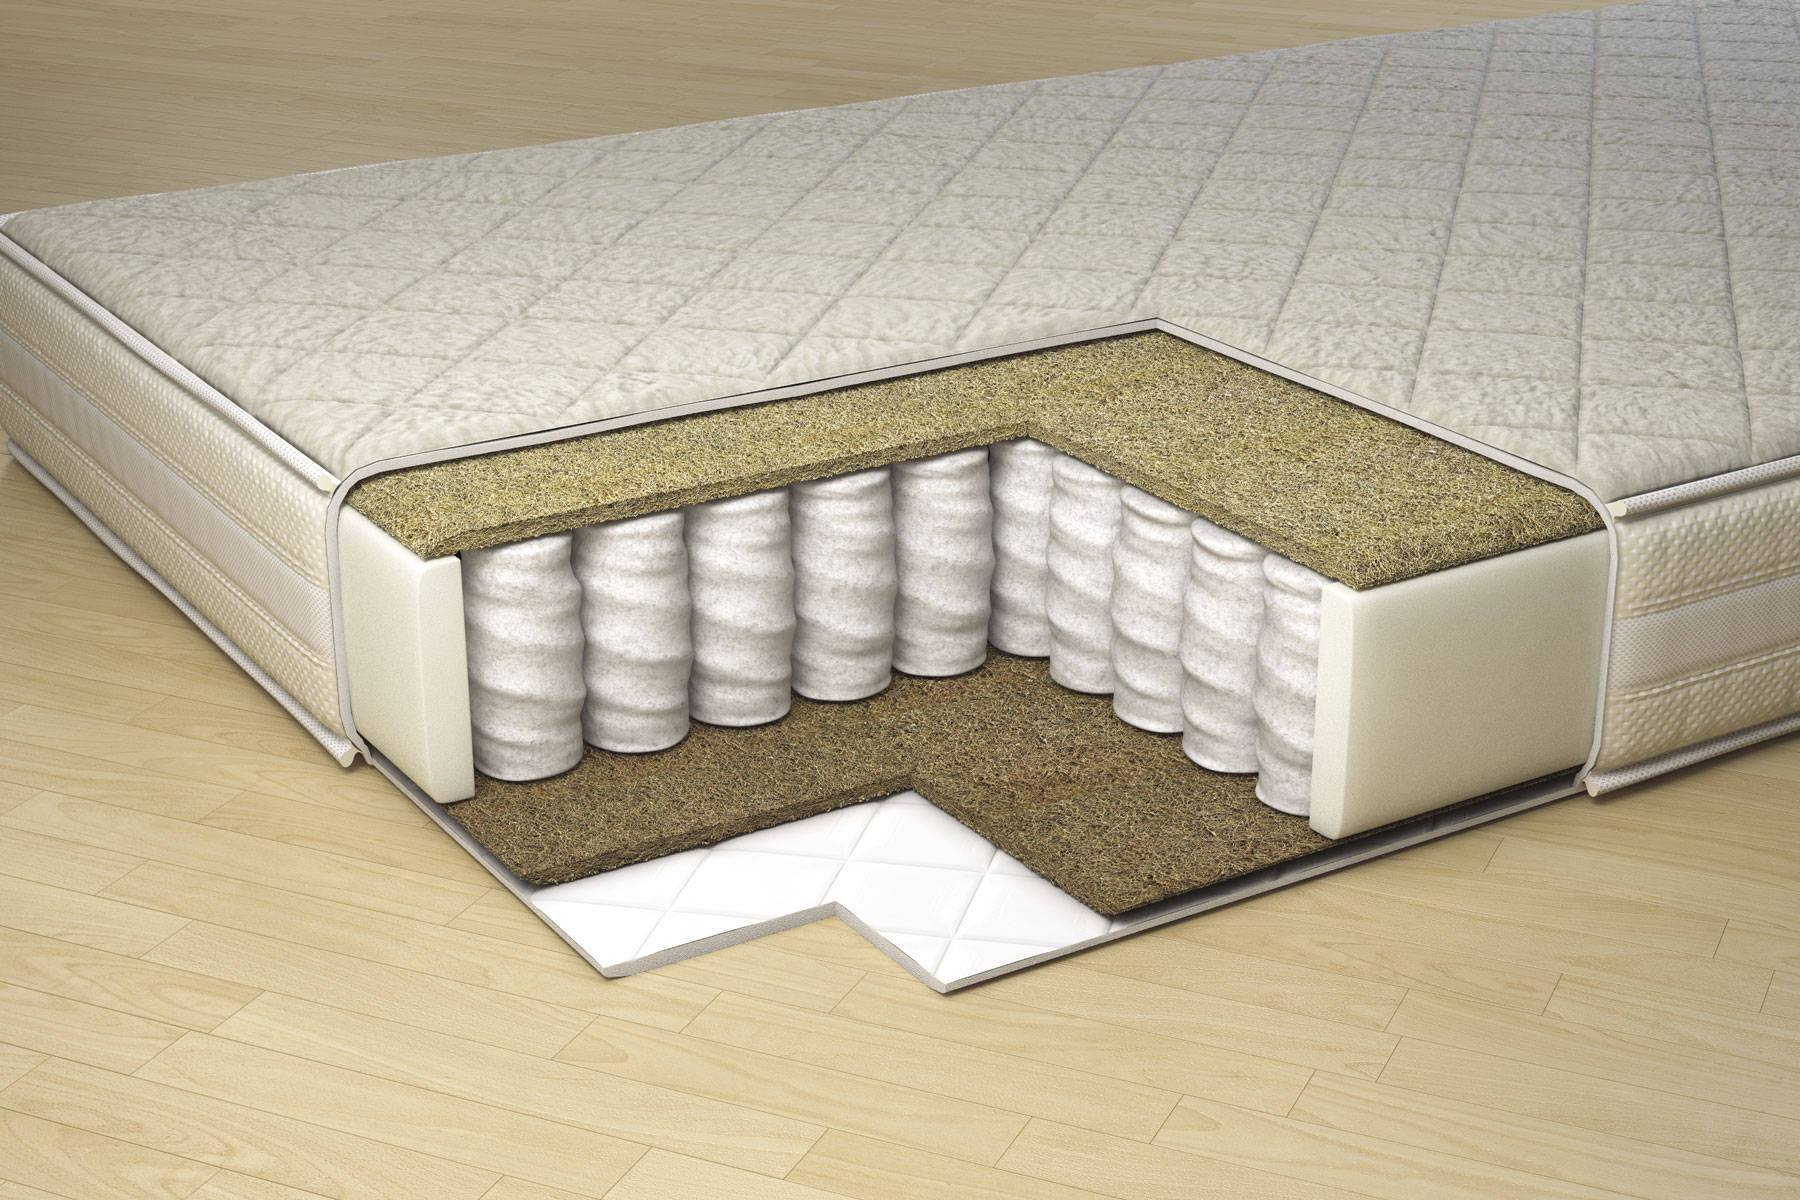 матрас для двуспальной кровати цена екатеринбург